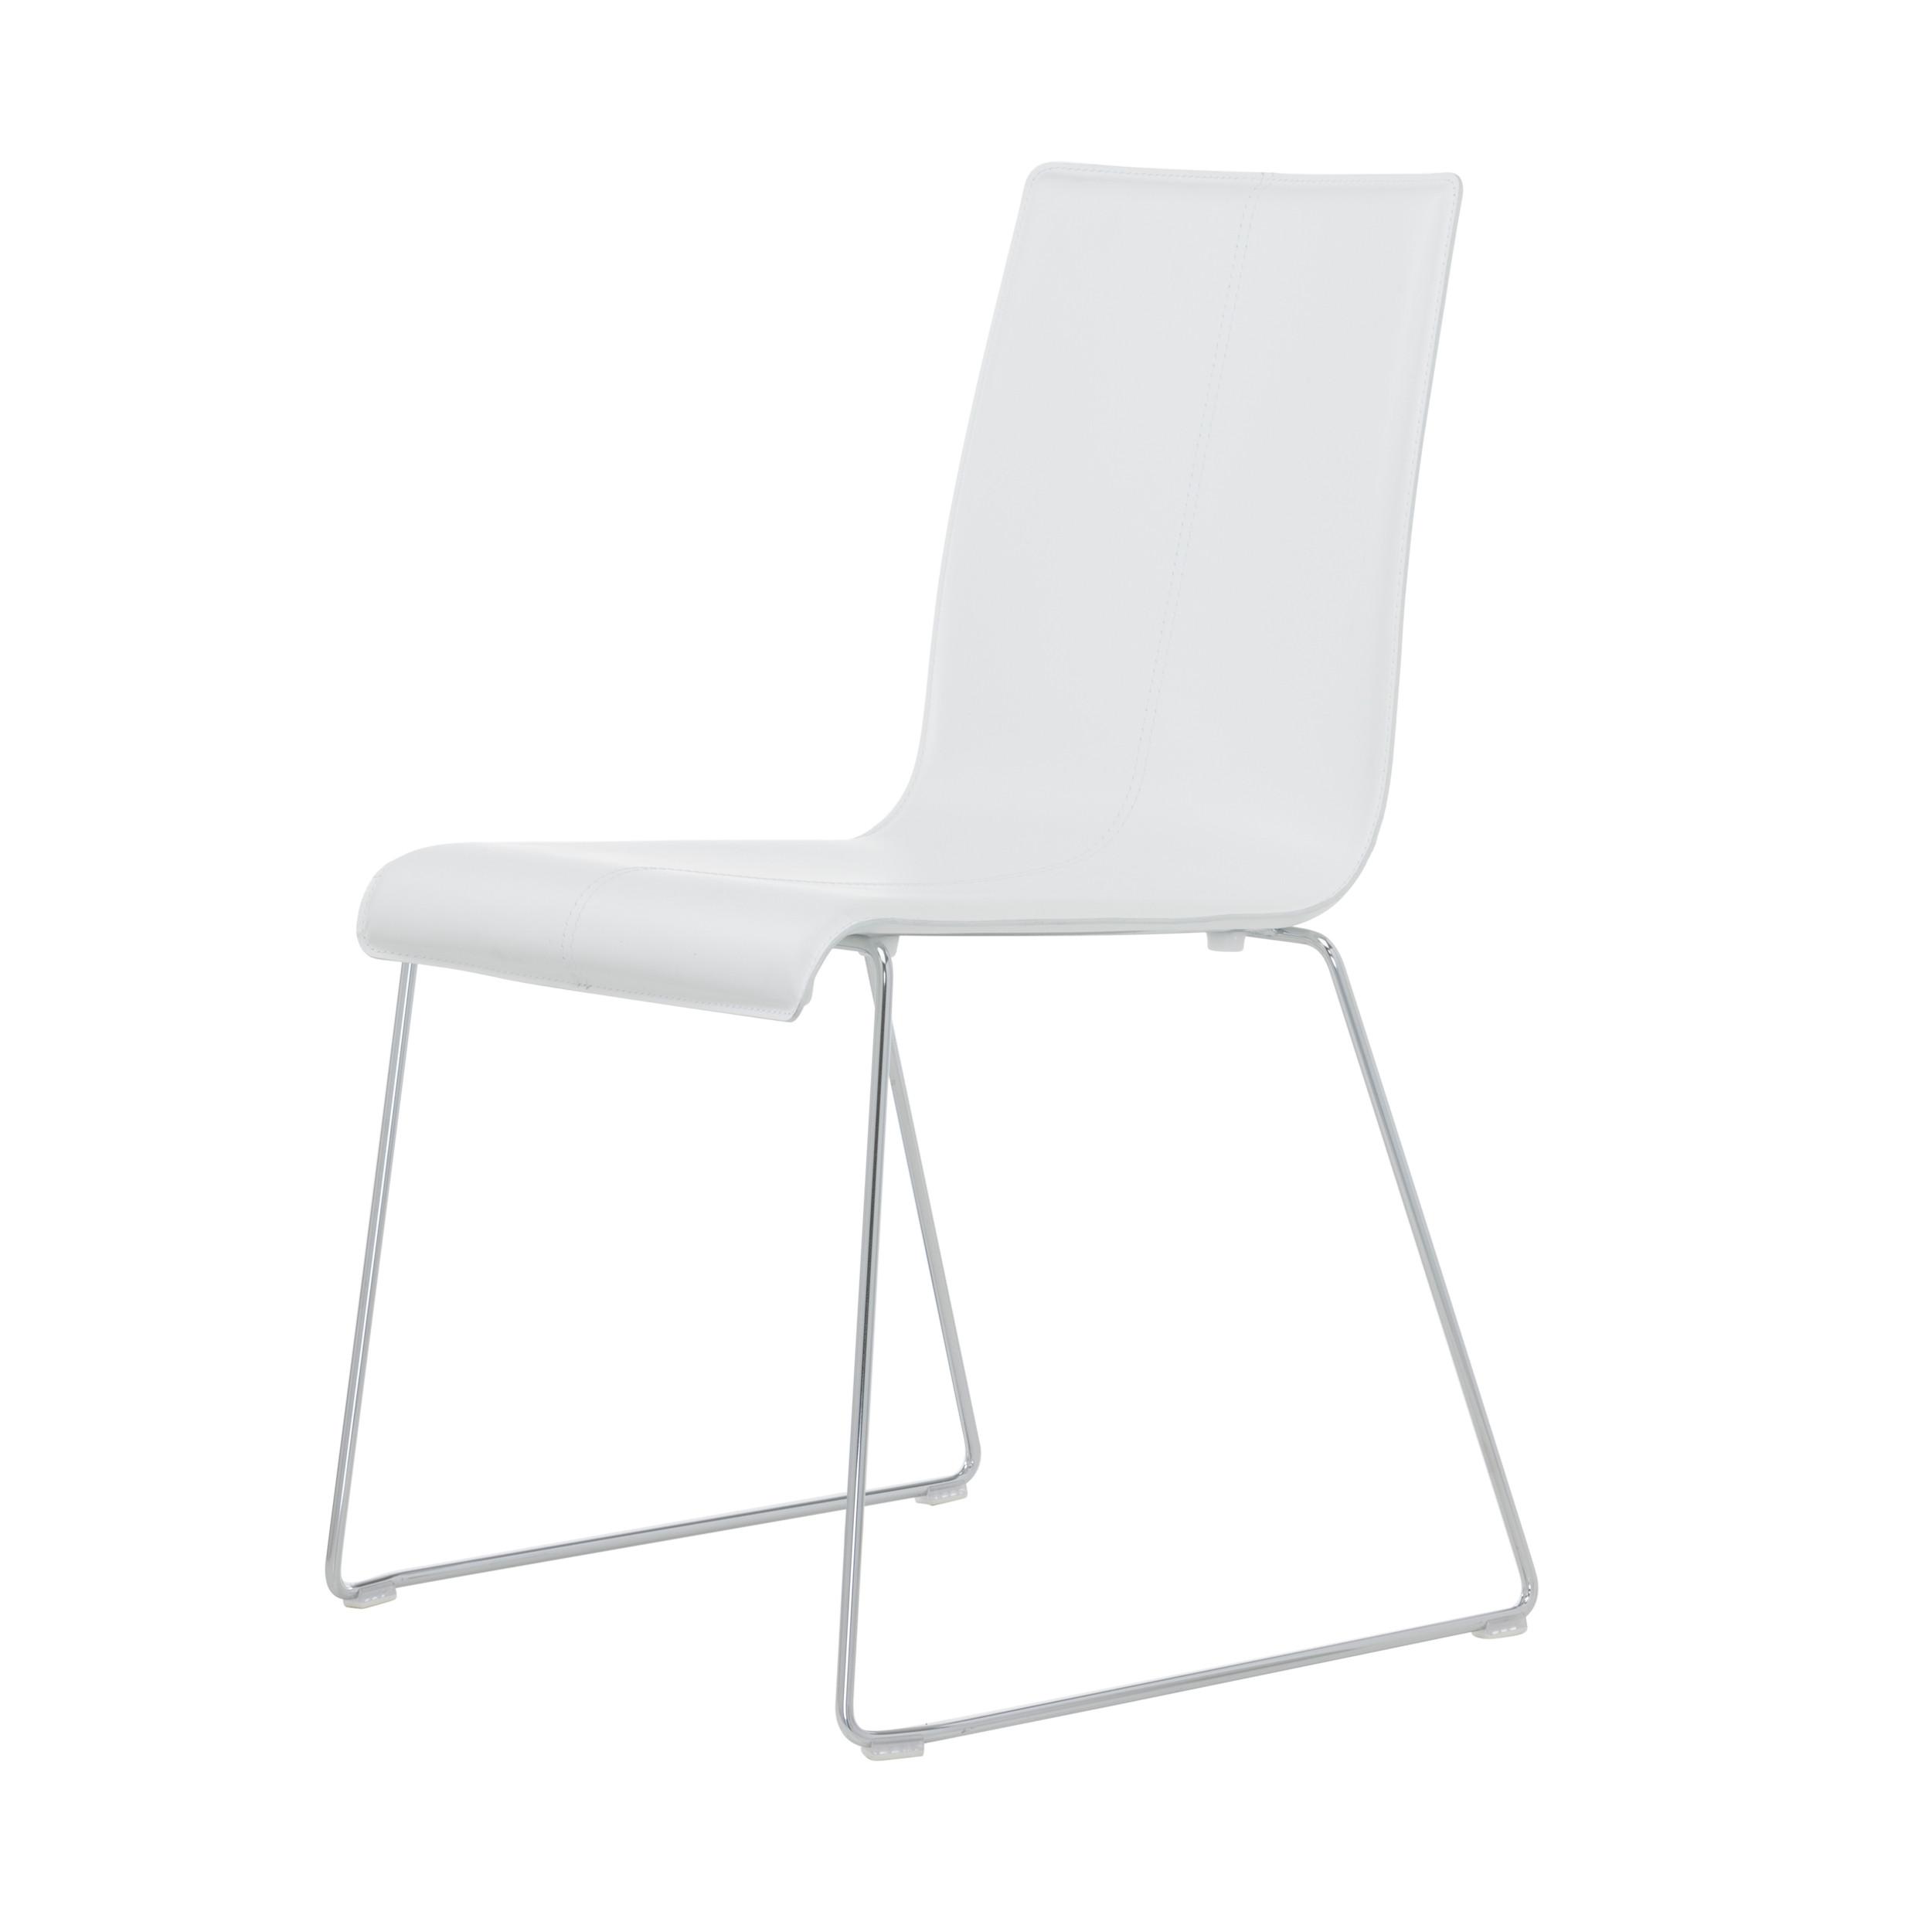 kuadra stuhl leder online kaufen bei woonio. Black Bedroom Furniture Sets. Home Design Ideas